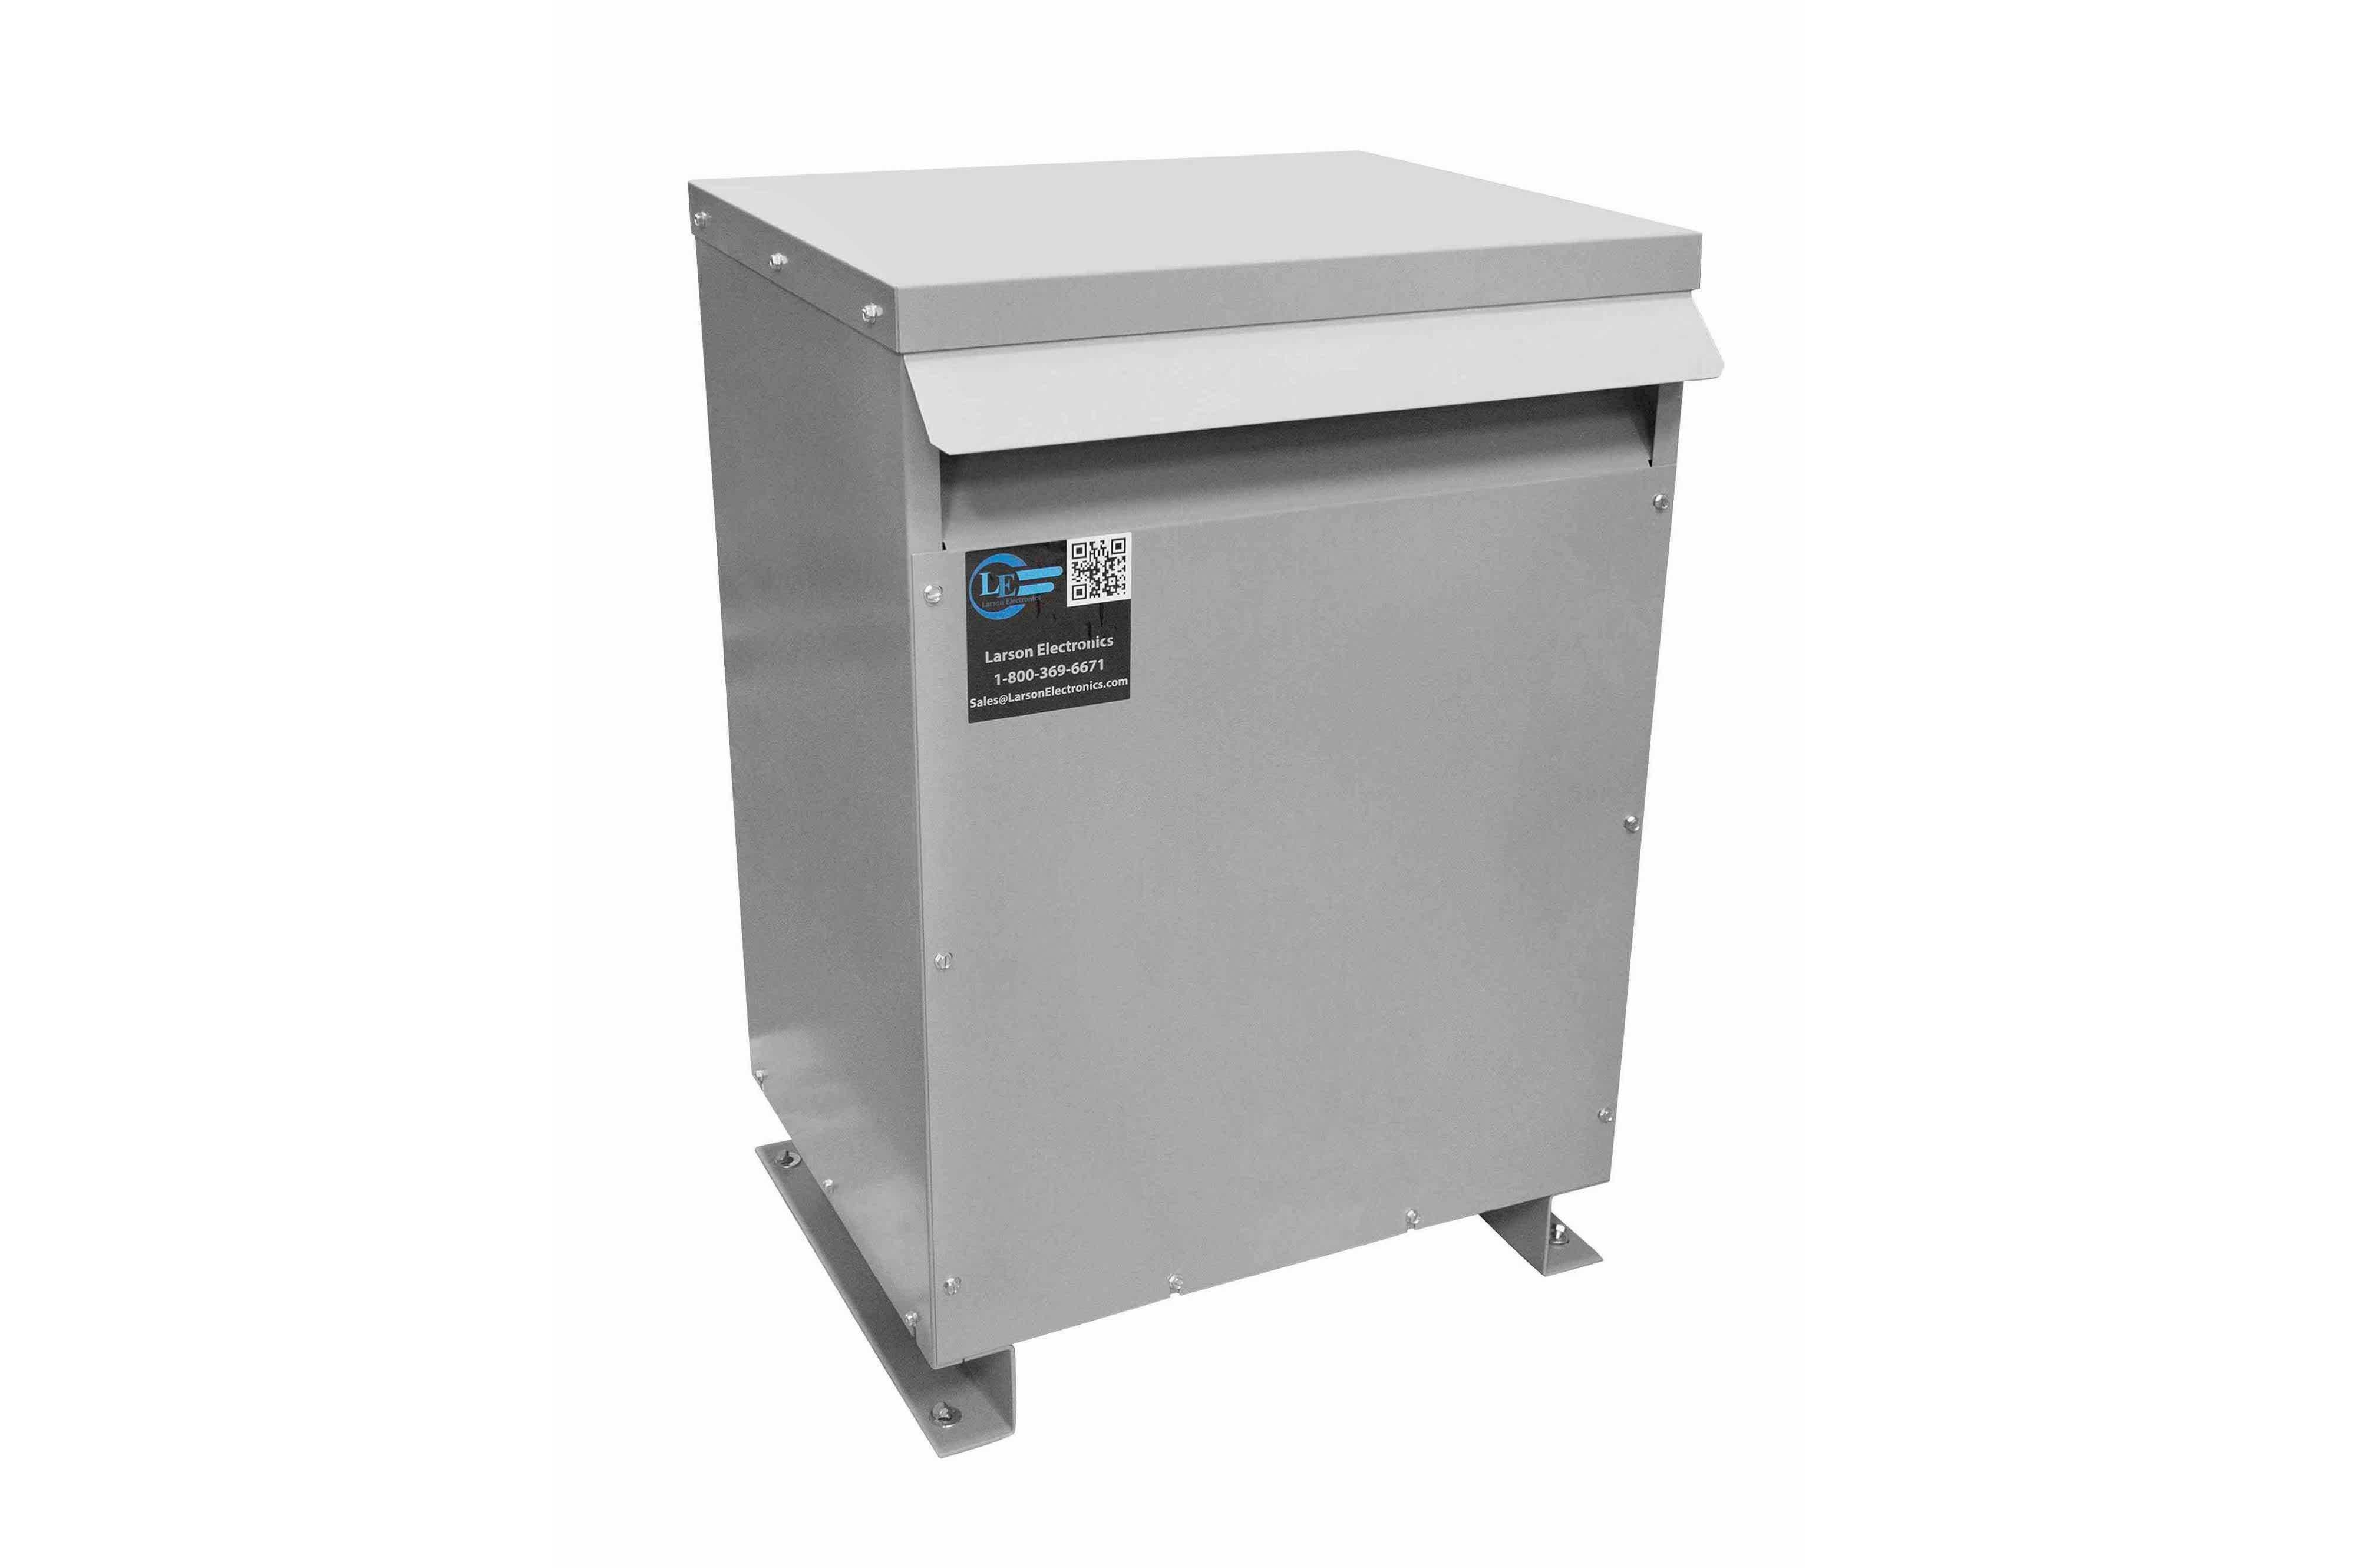 80 kVA 3PH DOE Transformer, 240V Delta Primary, 415Y/240 Wye-N Secondary, N3R, Ventilated, 60 Hz